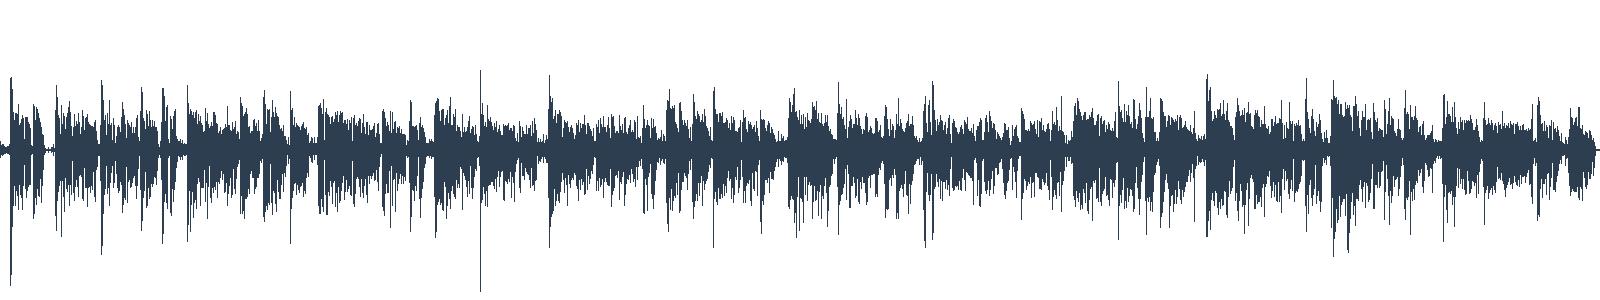 Nové audioknihy 36/2019 waveform